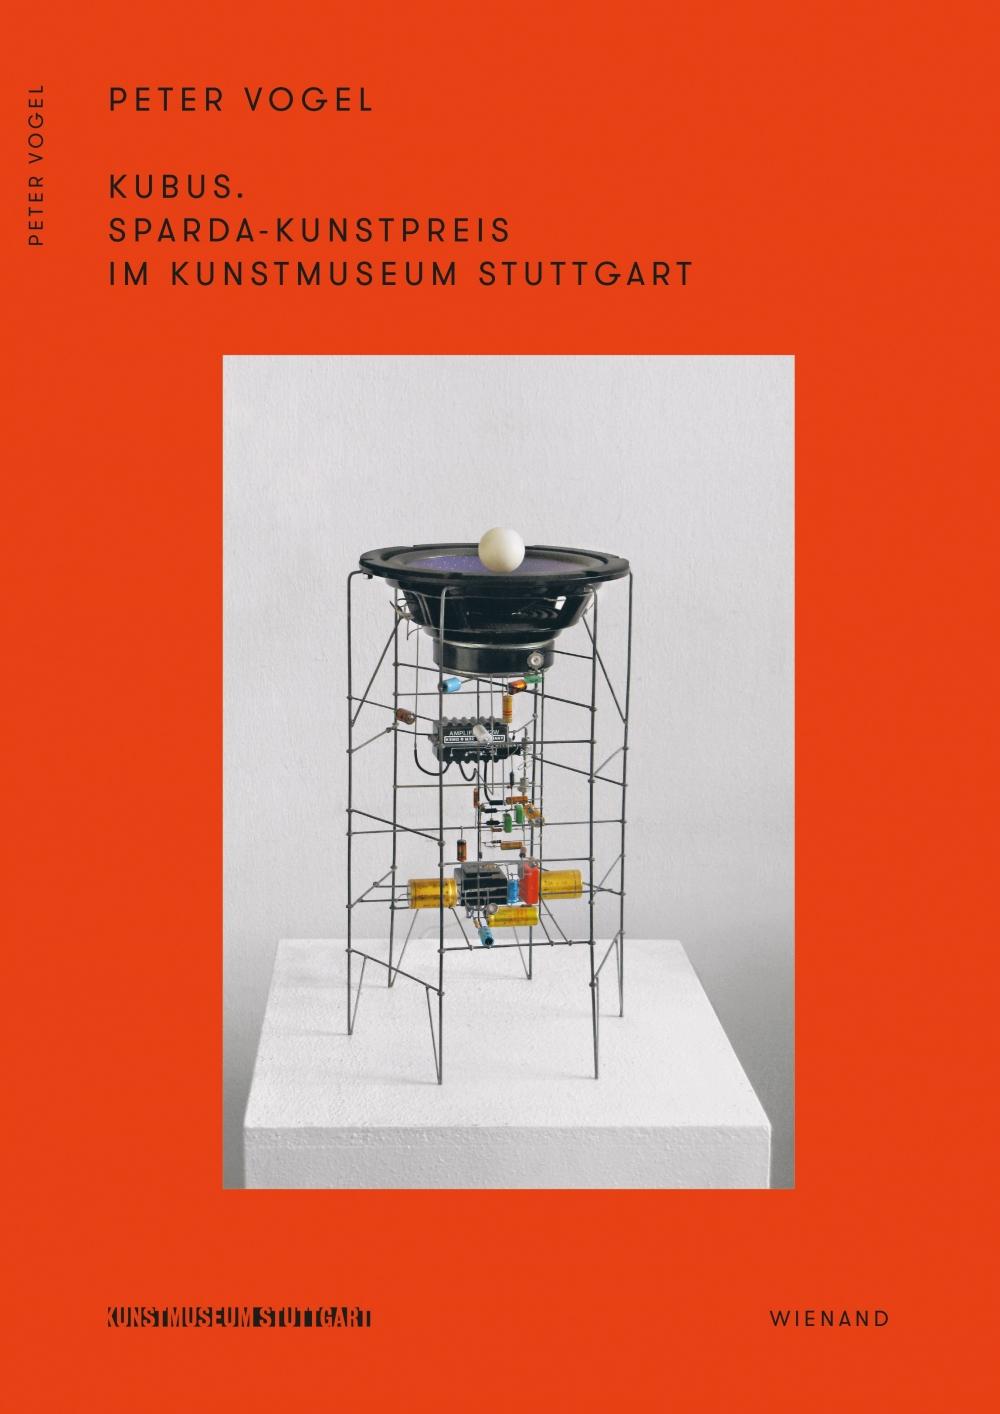 Kubus Sparda Kunstpreis Im Kunstmuseum Stuttgart